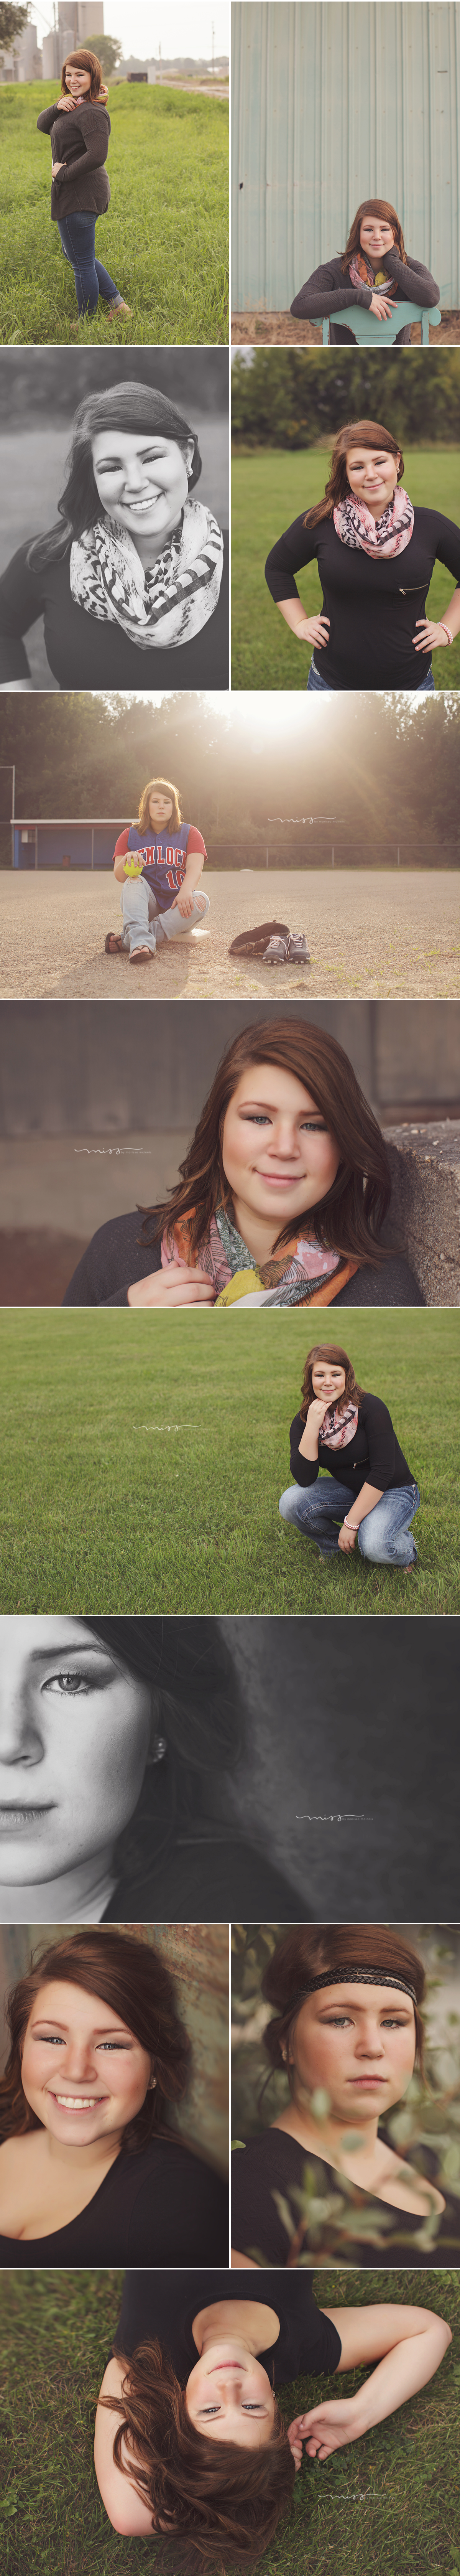 Michigan Senior Photographer | Amy Hemlock High School 2